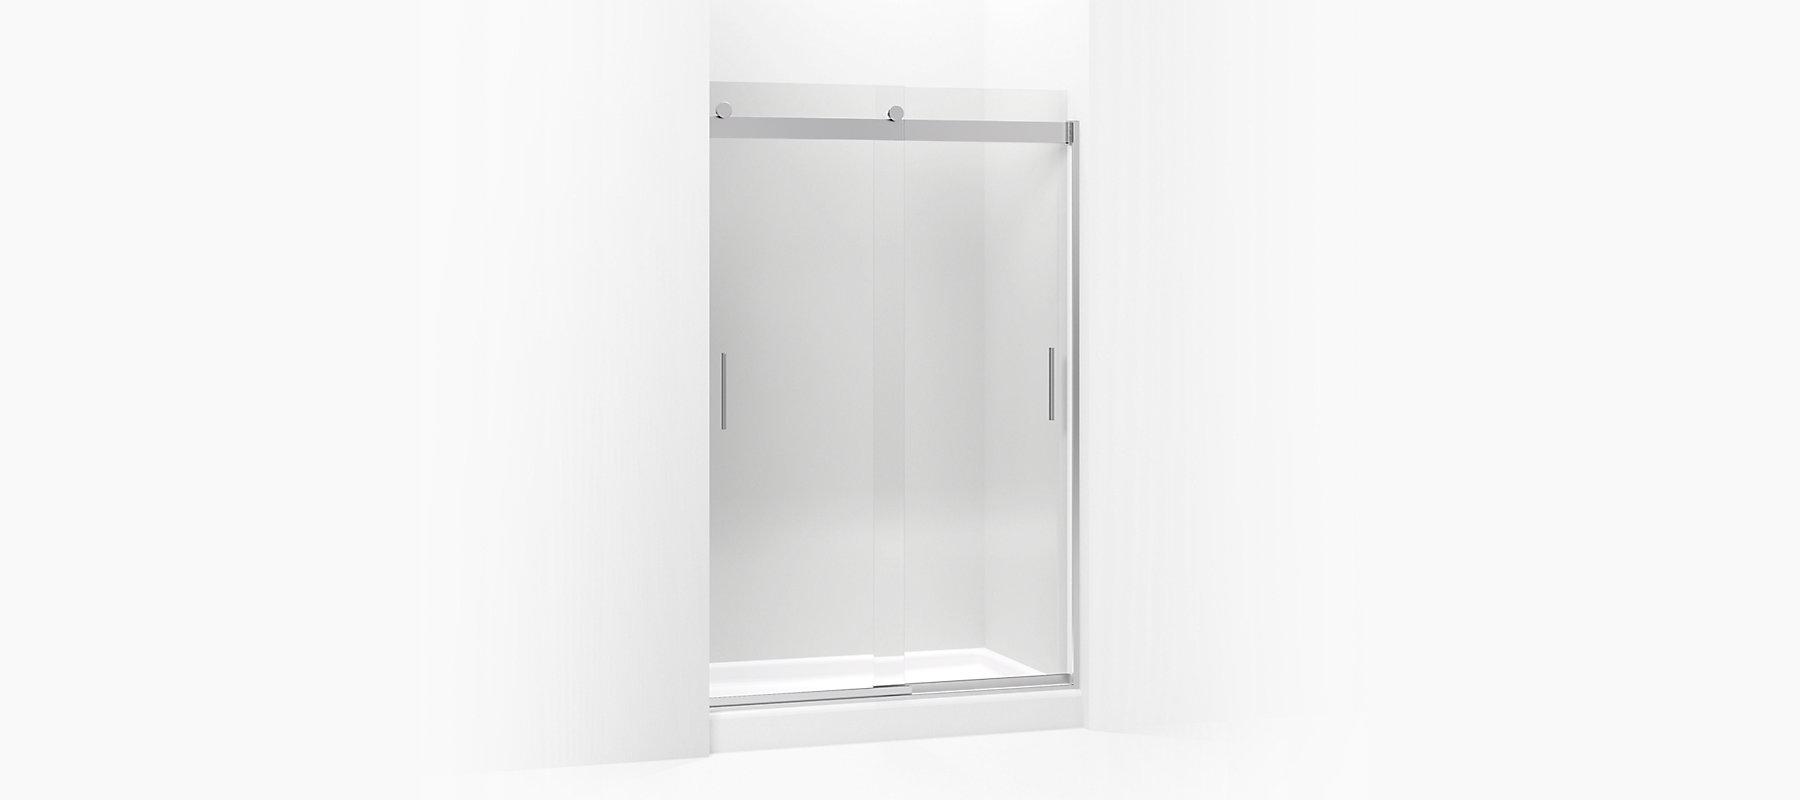 Kohler Shower Doors Levity Beautify The Bathroom With